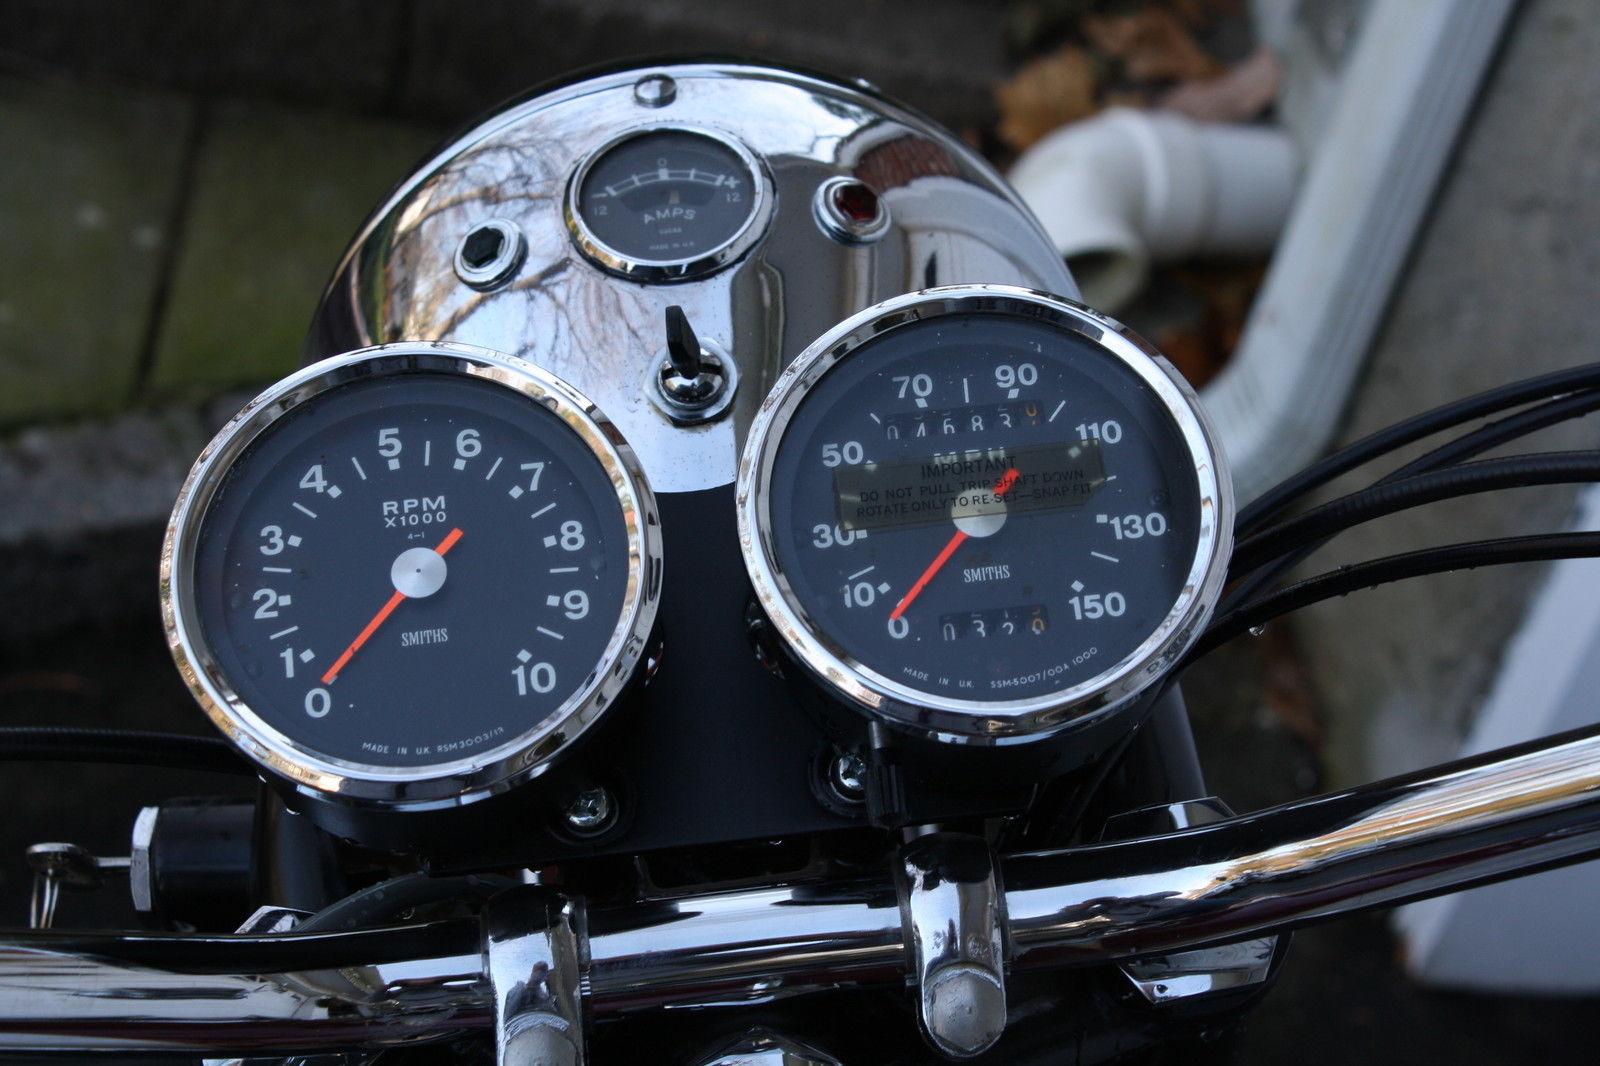 Triumph Bonneville - 1970 - Headlight, Clocks, Speedometer, Switch and Handlebars.